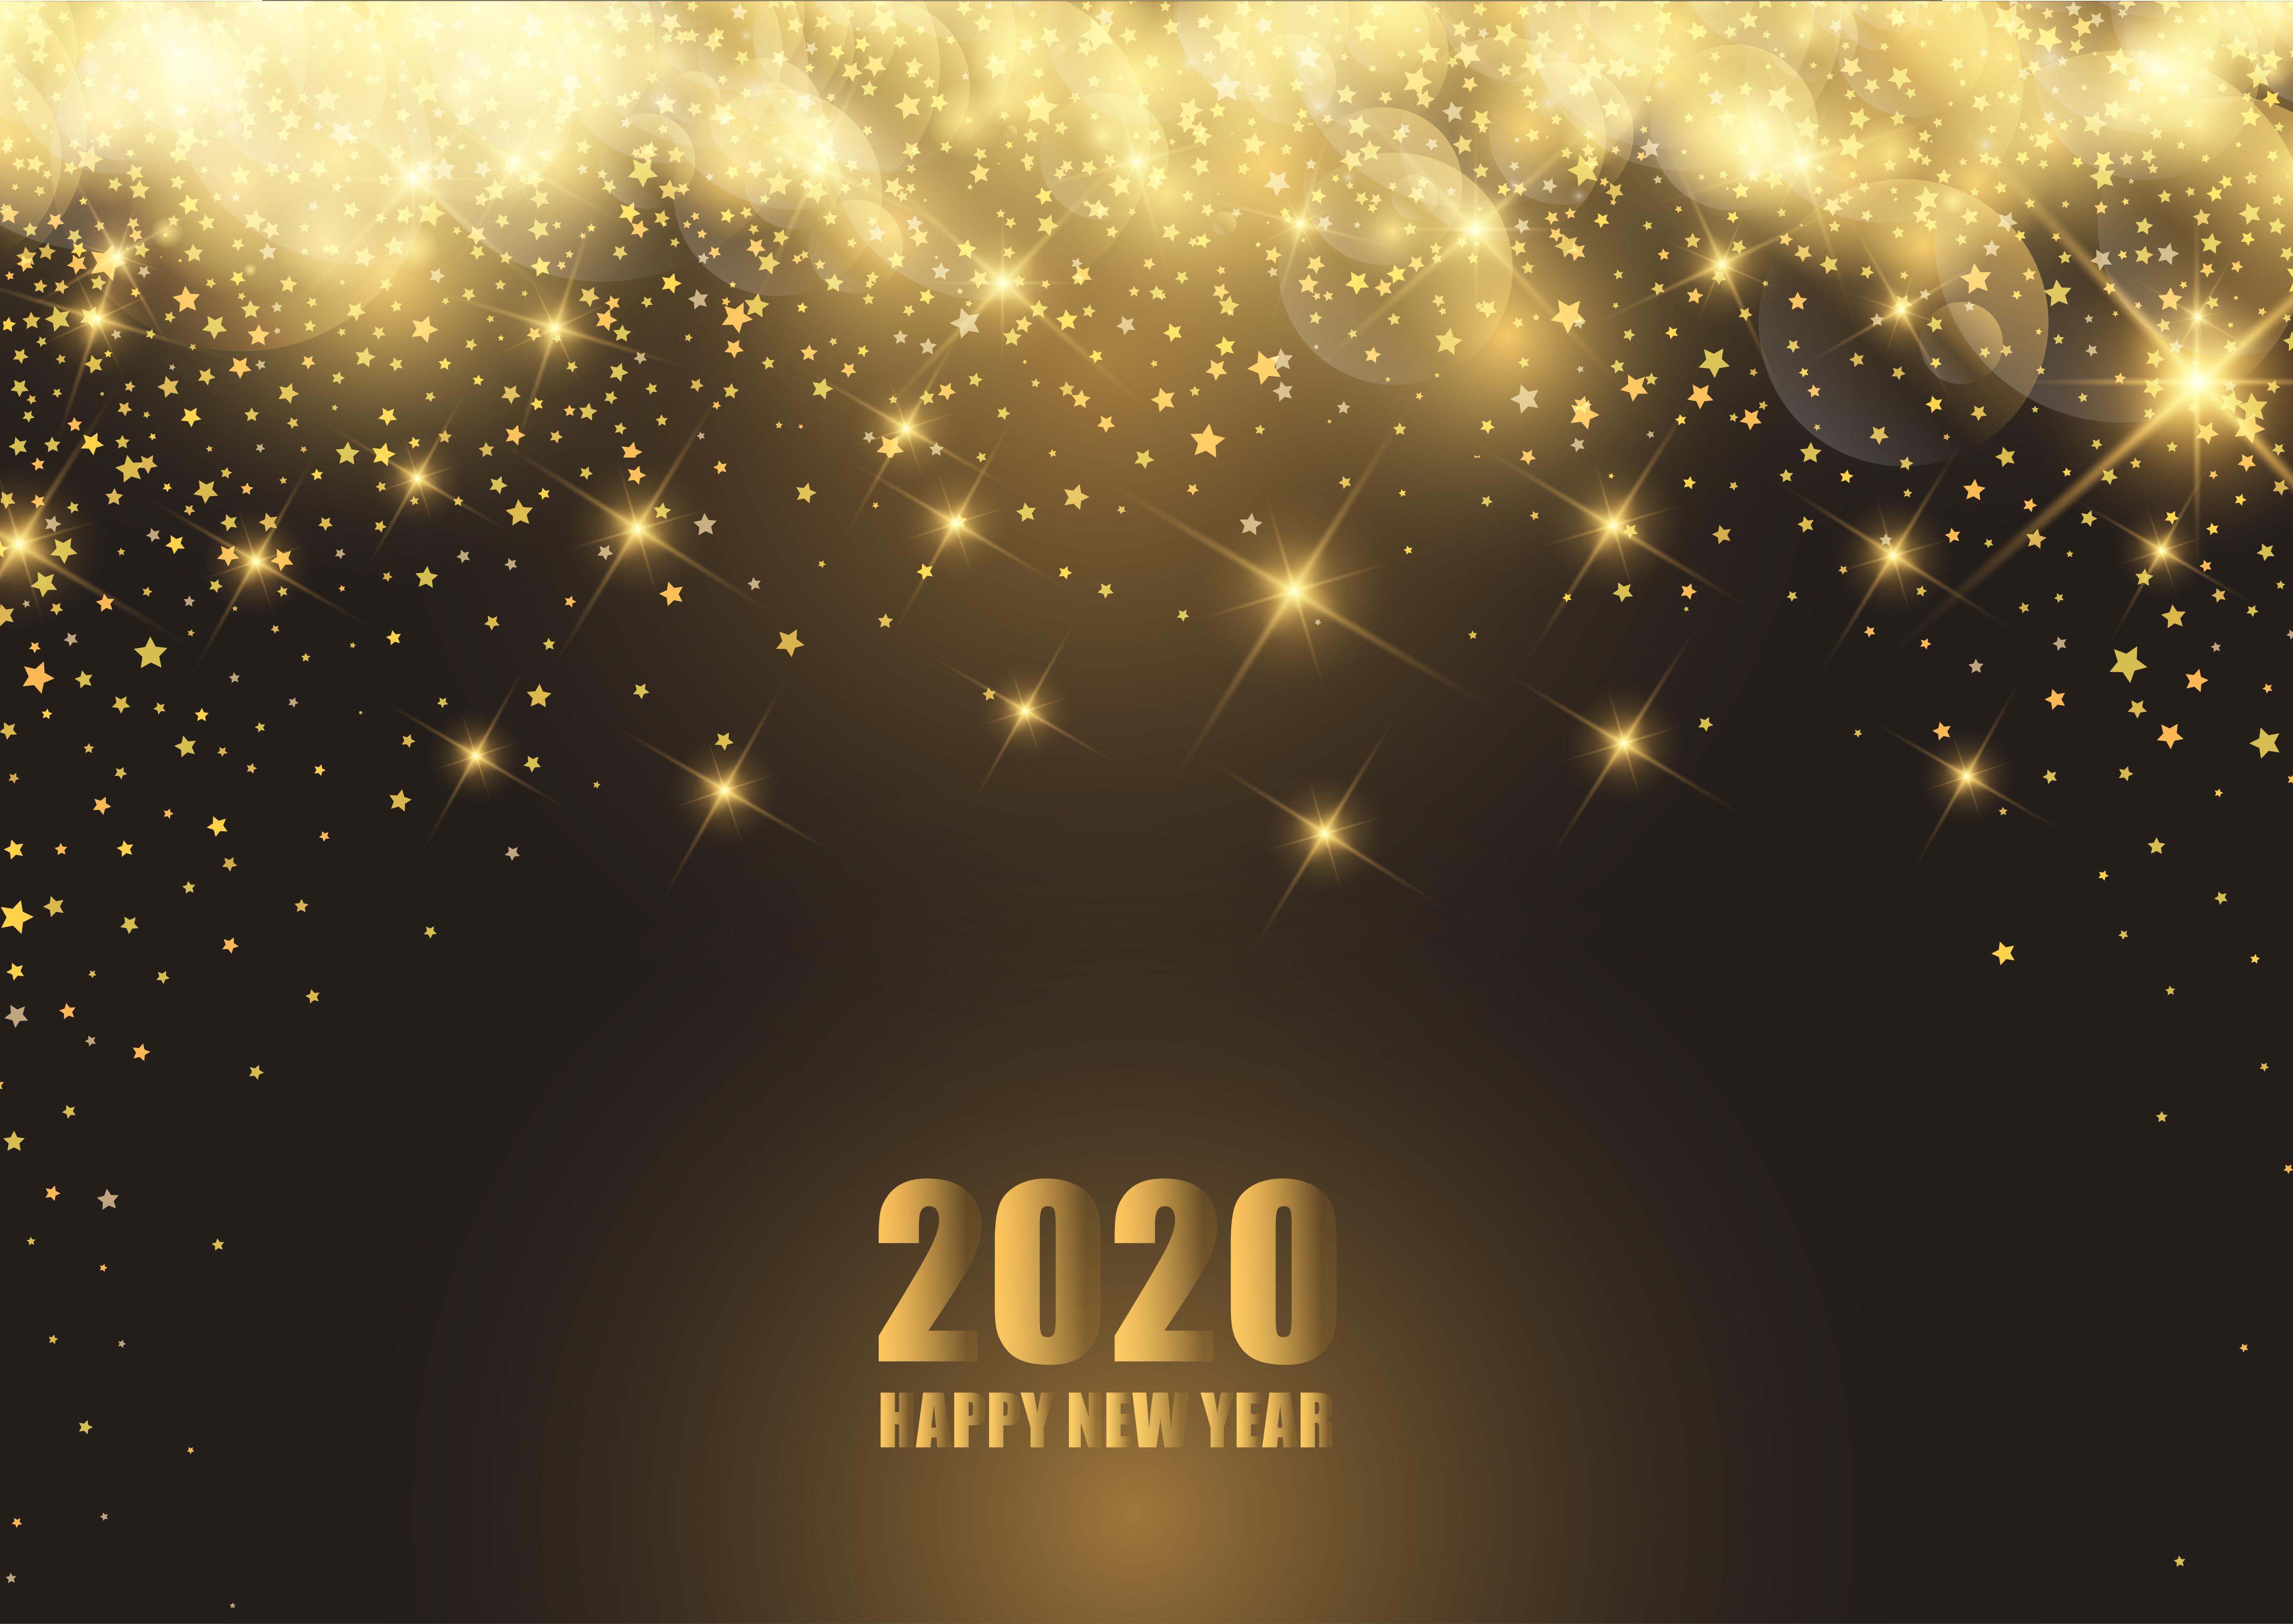 happy new year background with starry design download free vectors clipart graphics vector art vecteezy